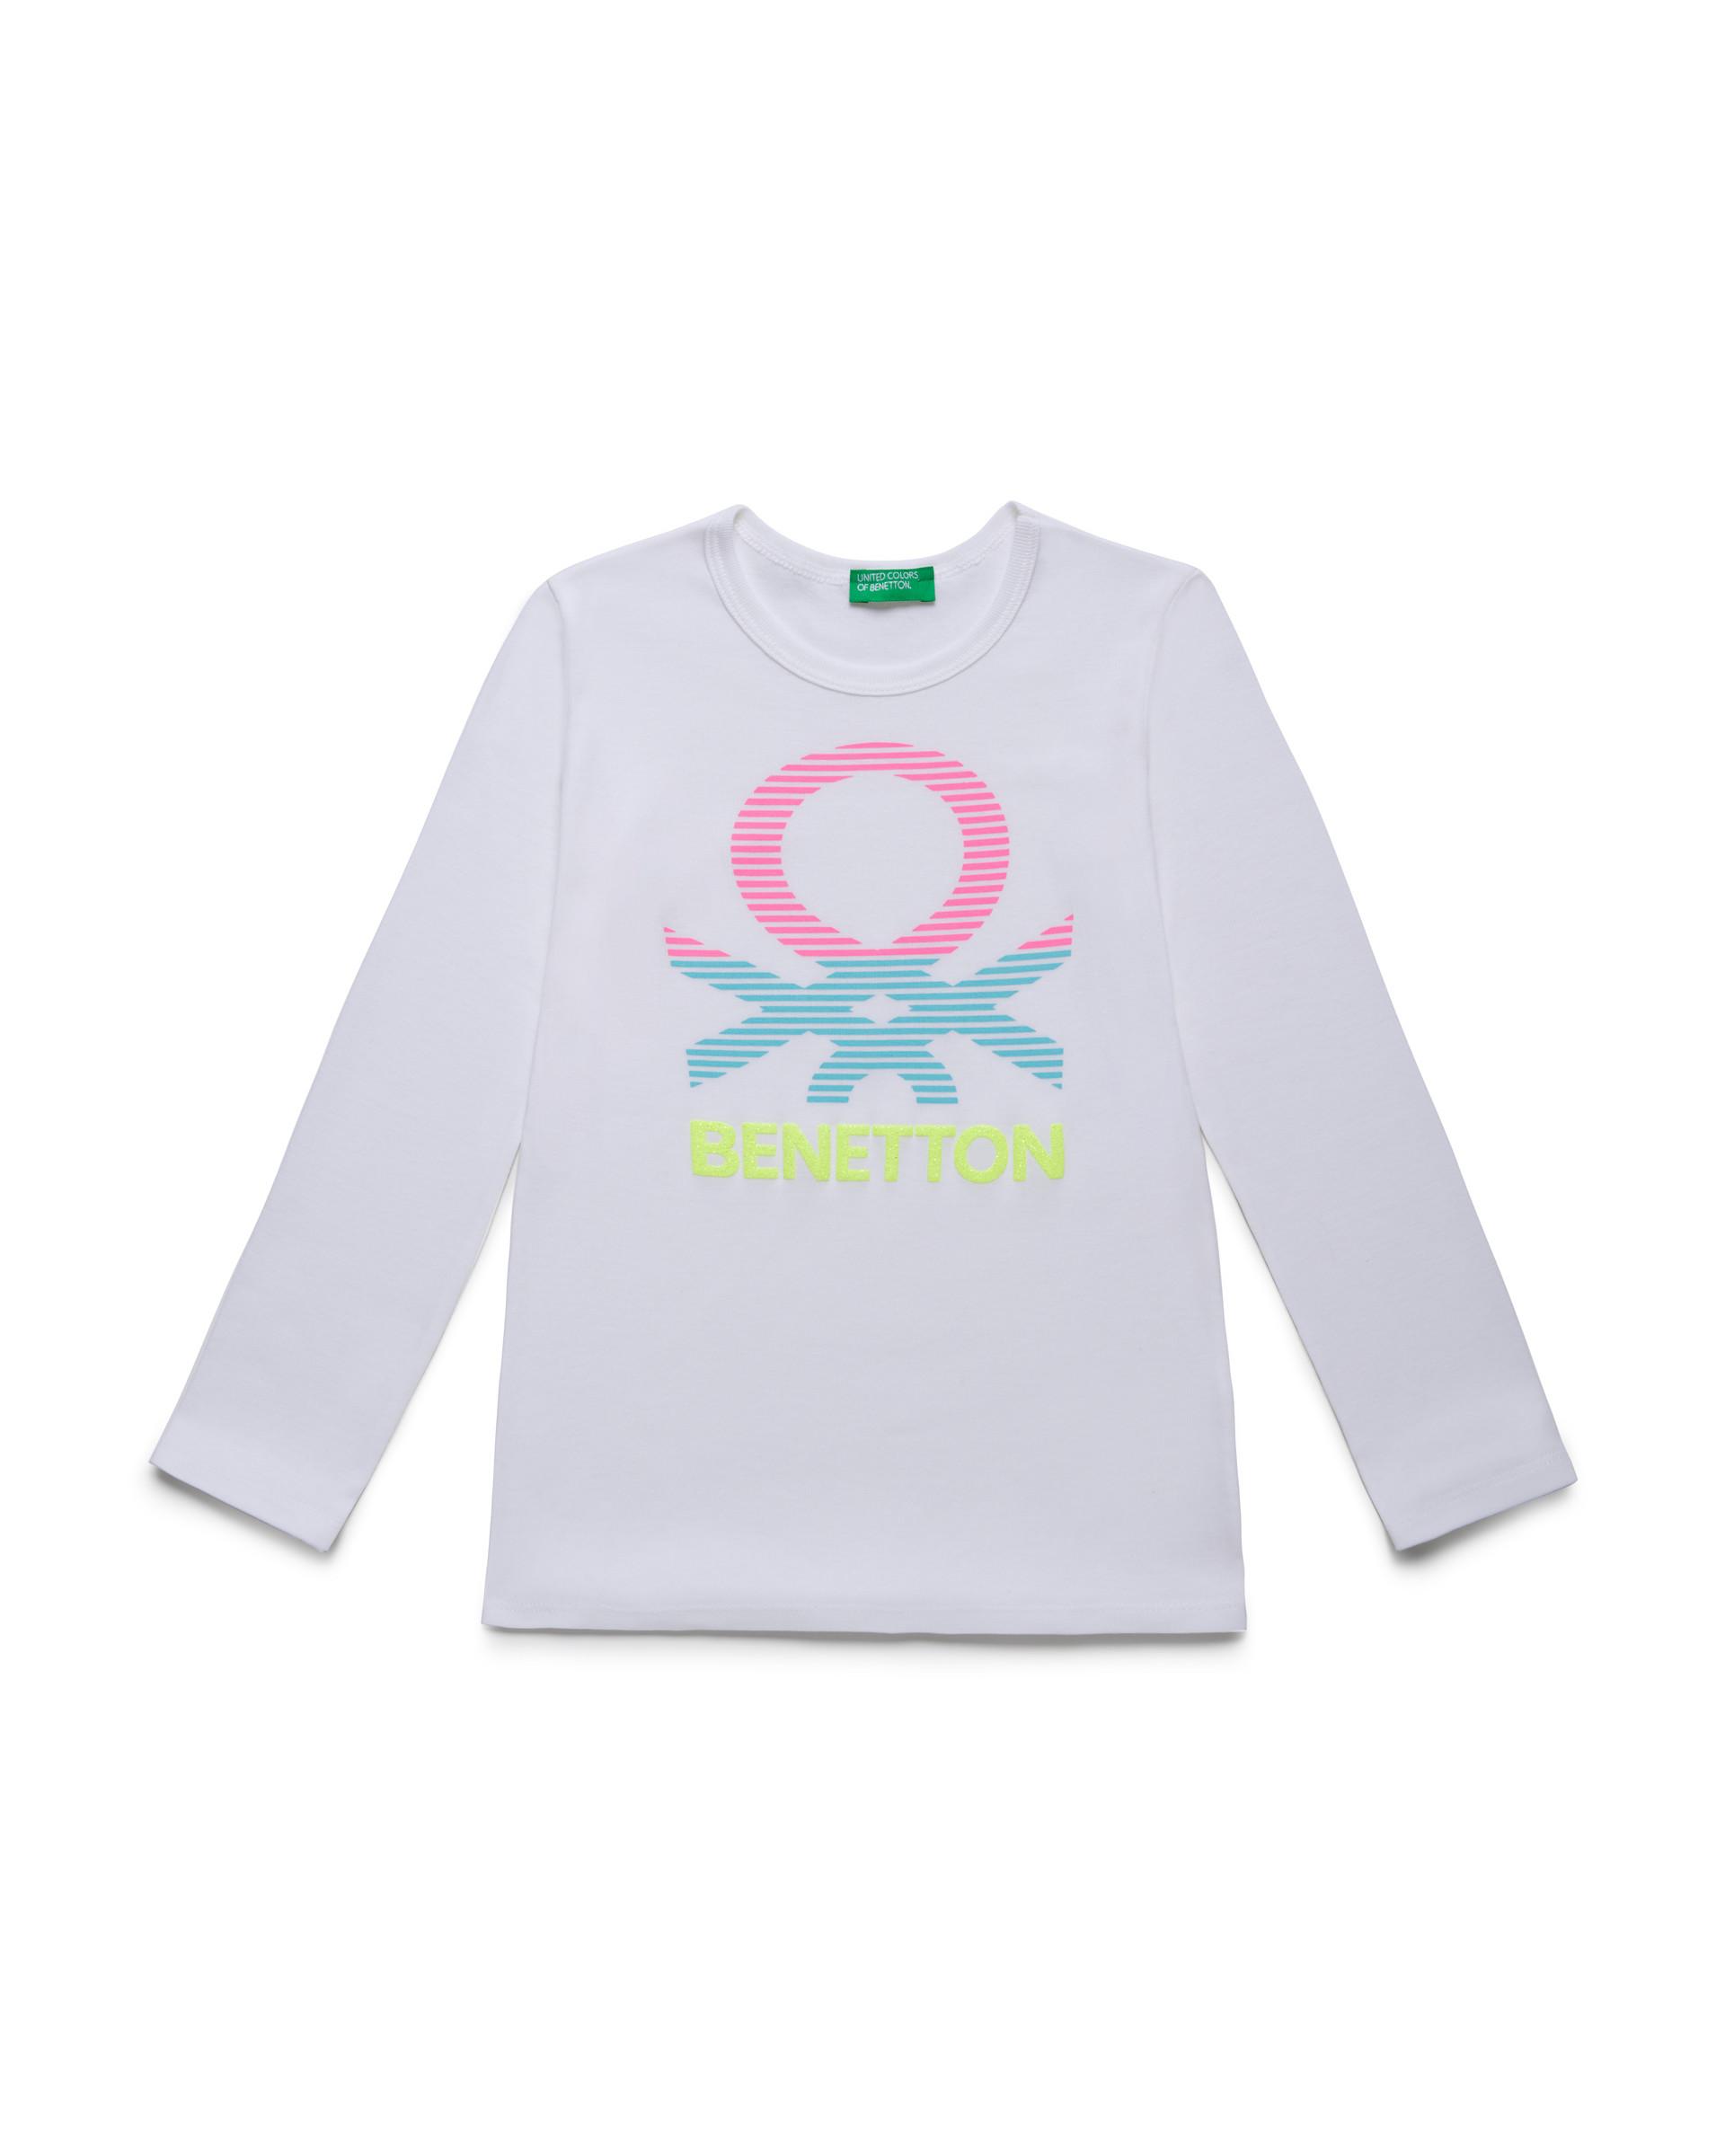 Купить 20P_3I9WC14J3_101, Футболка для девочек Benetton 3I9WC14J3_101 р-р 110, United Colors of Benetton, Футболки для девочек